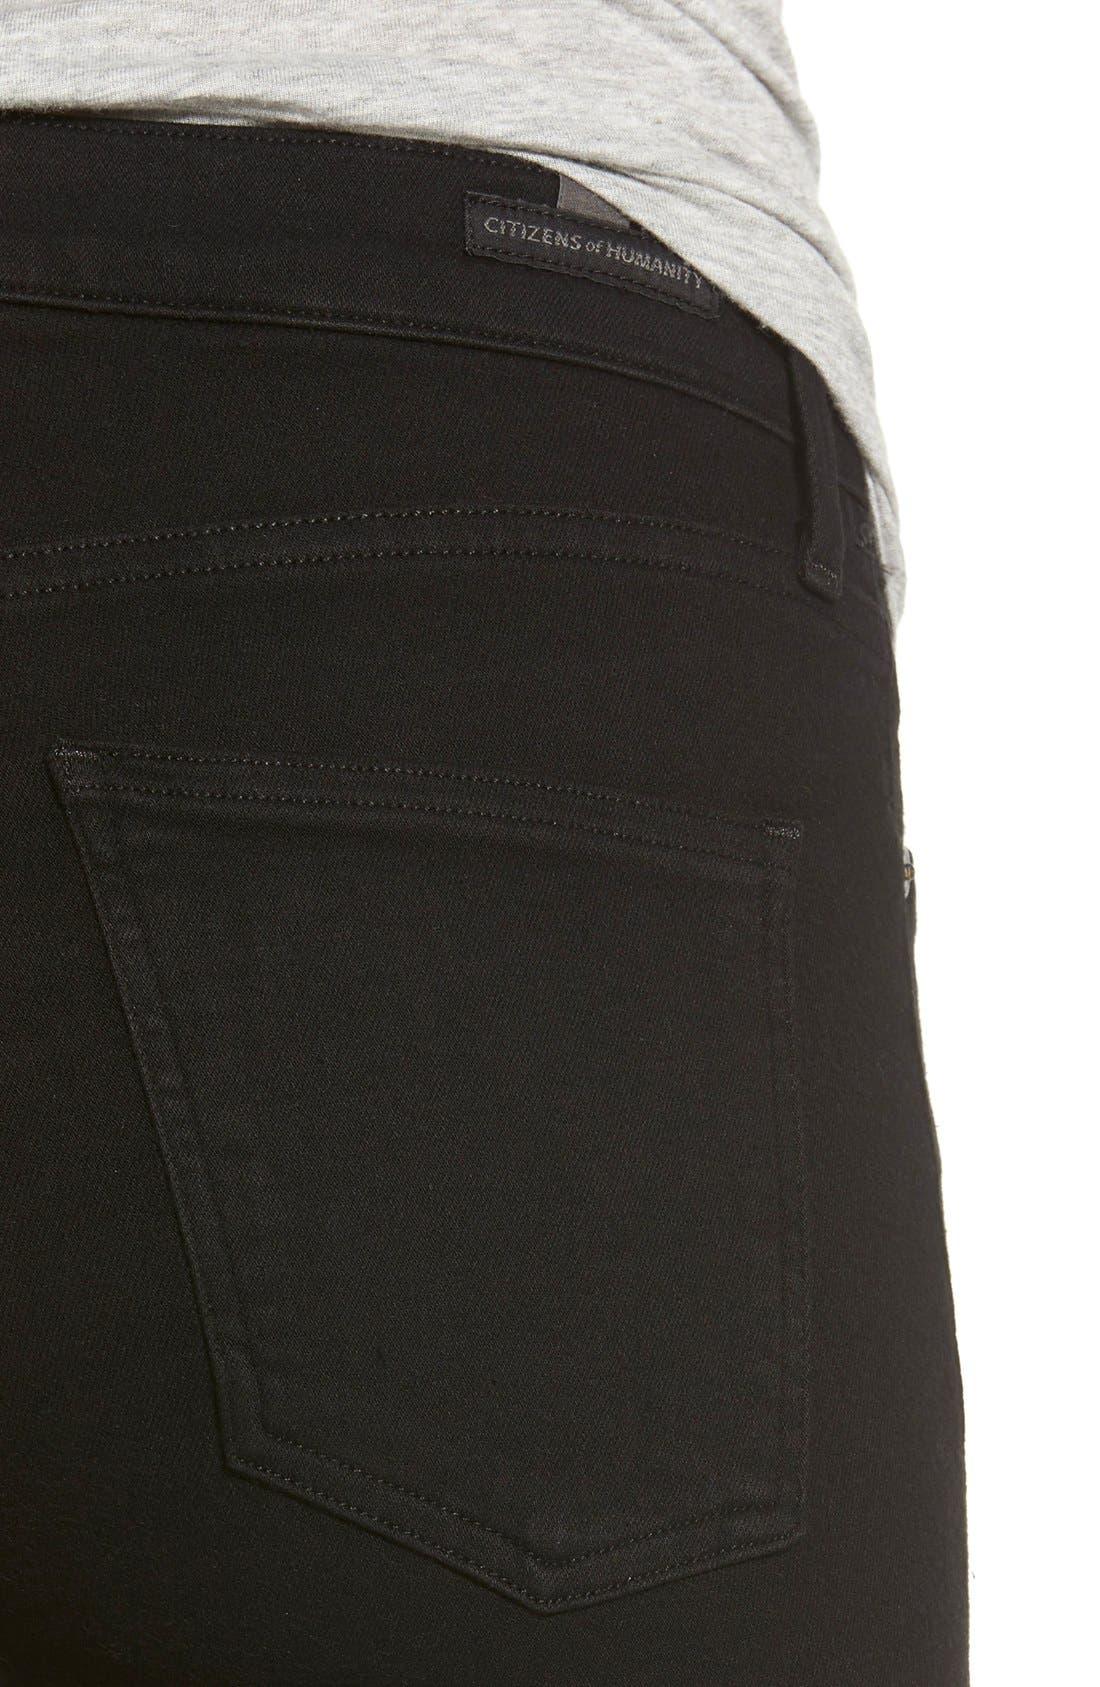 Rocket High Waist Skinny Jeans,                             Alternate thumbnail 4, color,                             Black